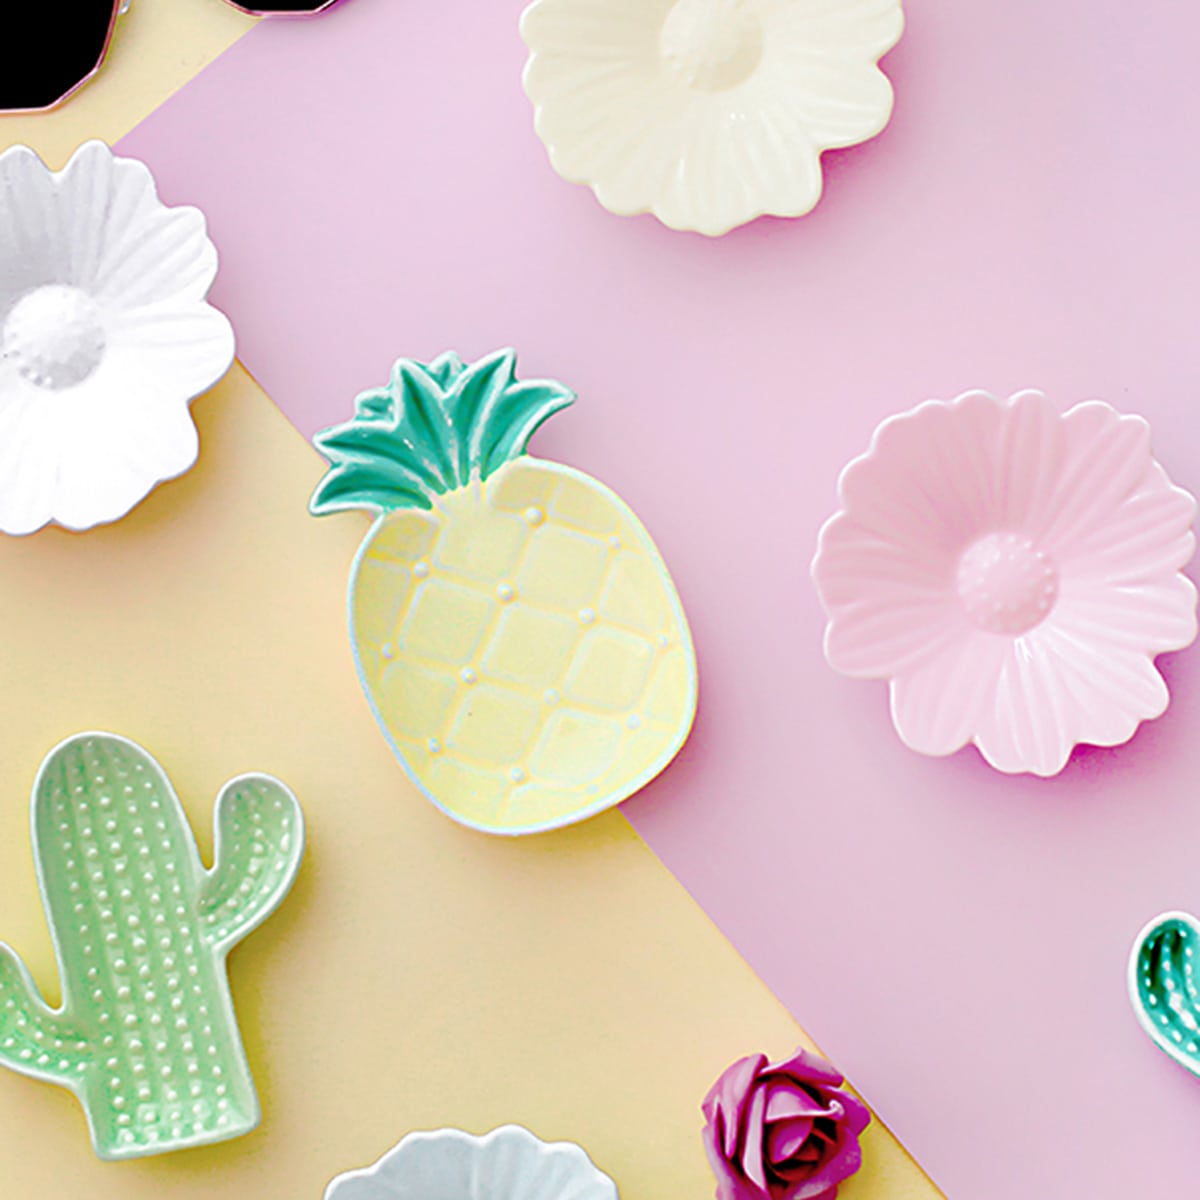 Blume & Kaktus förmige Keramikplatte 1 Stück